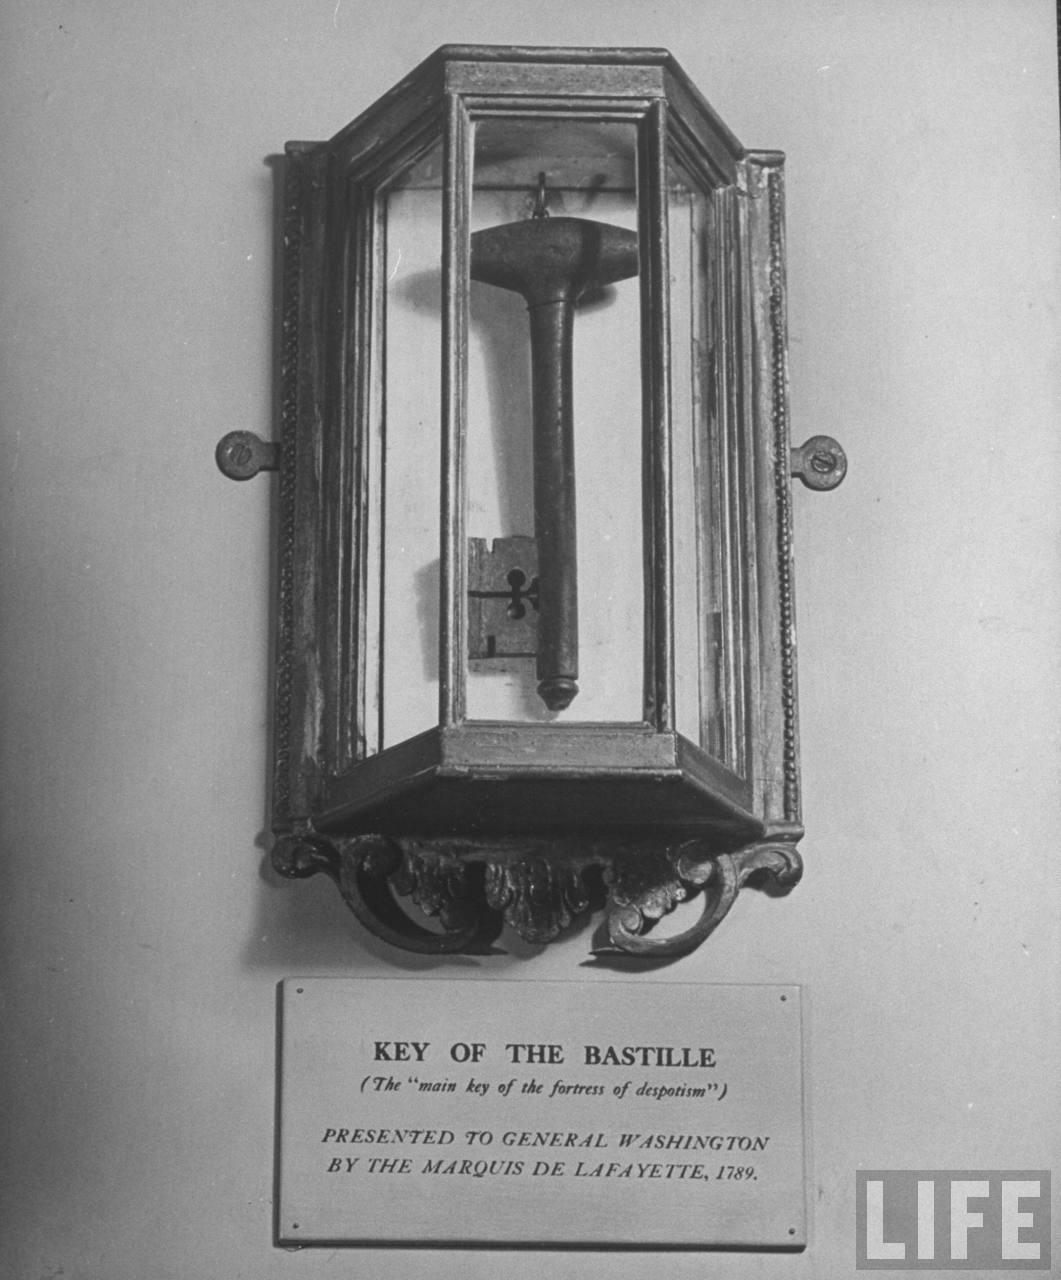 Key to the Bastille at Mount Vernon